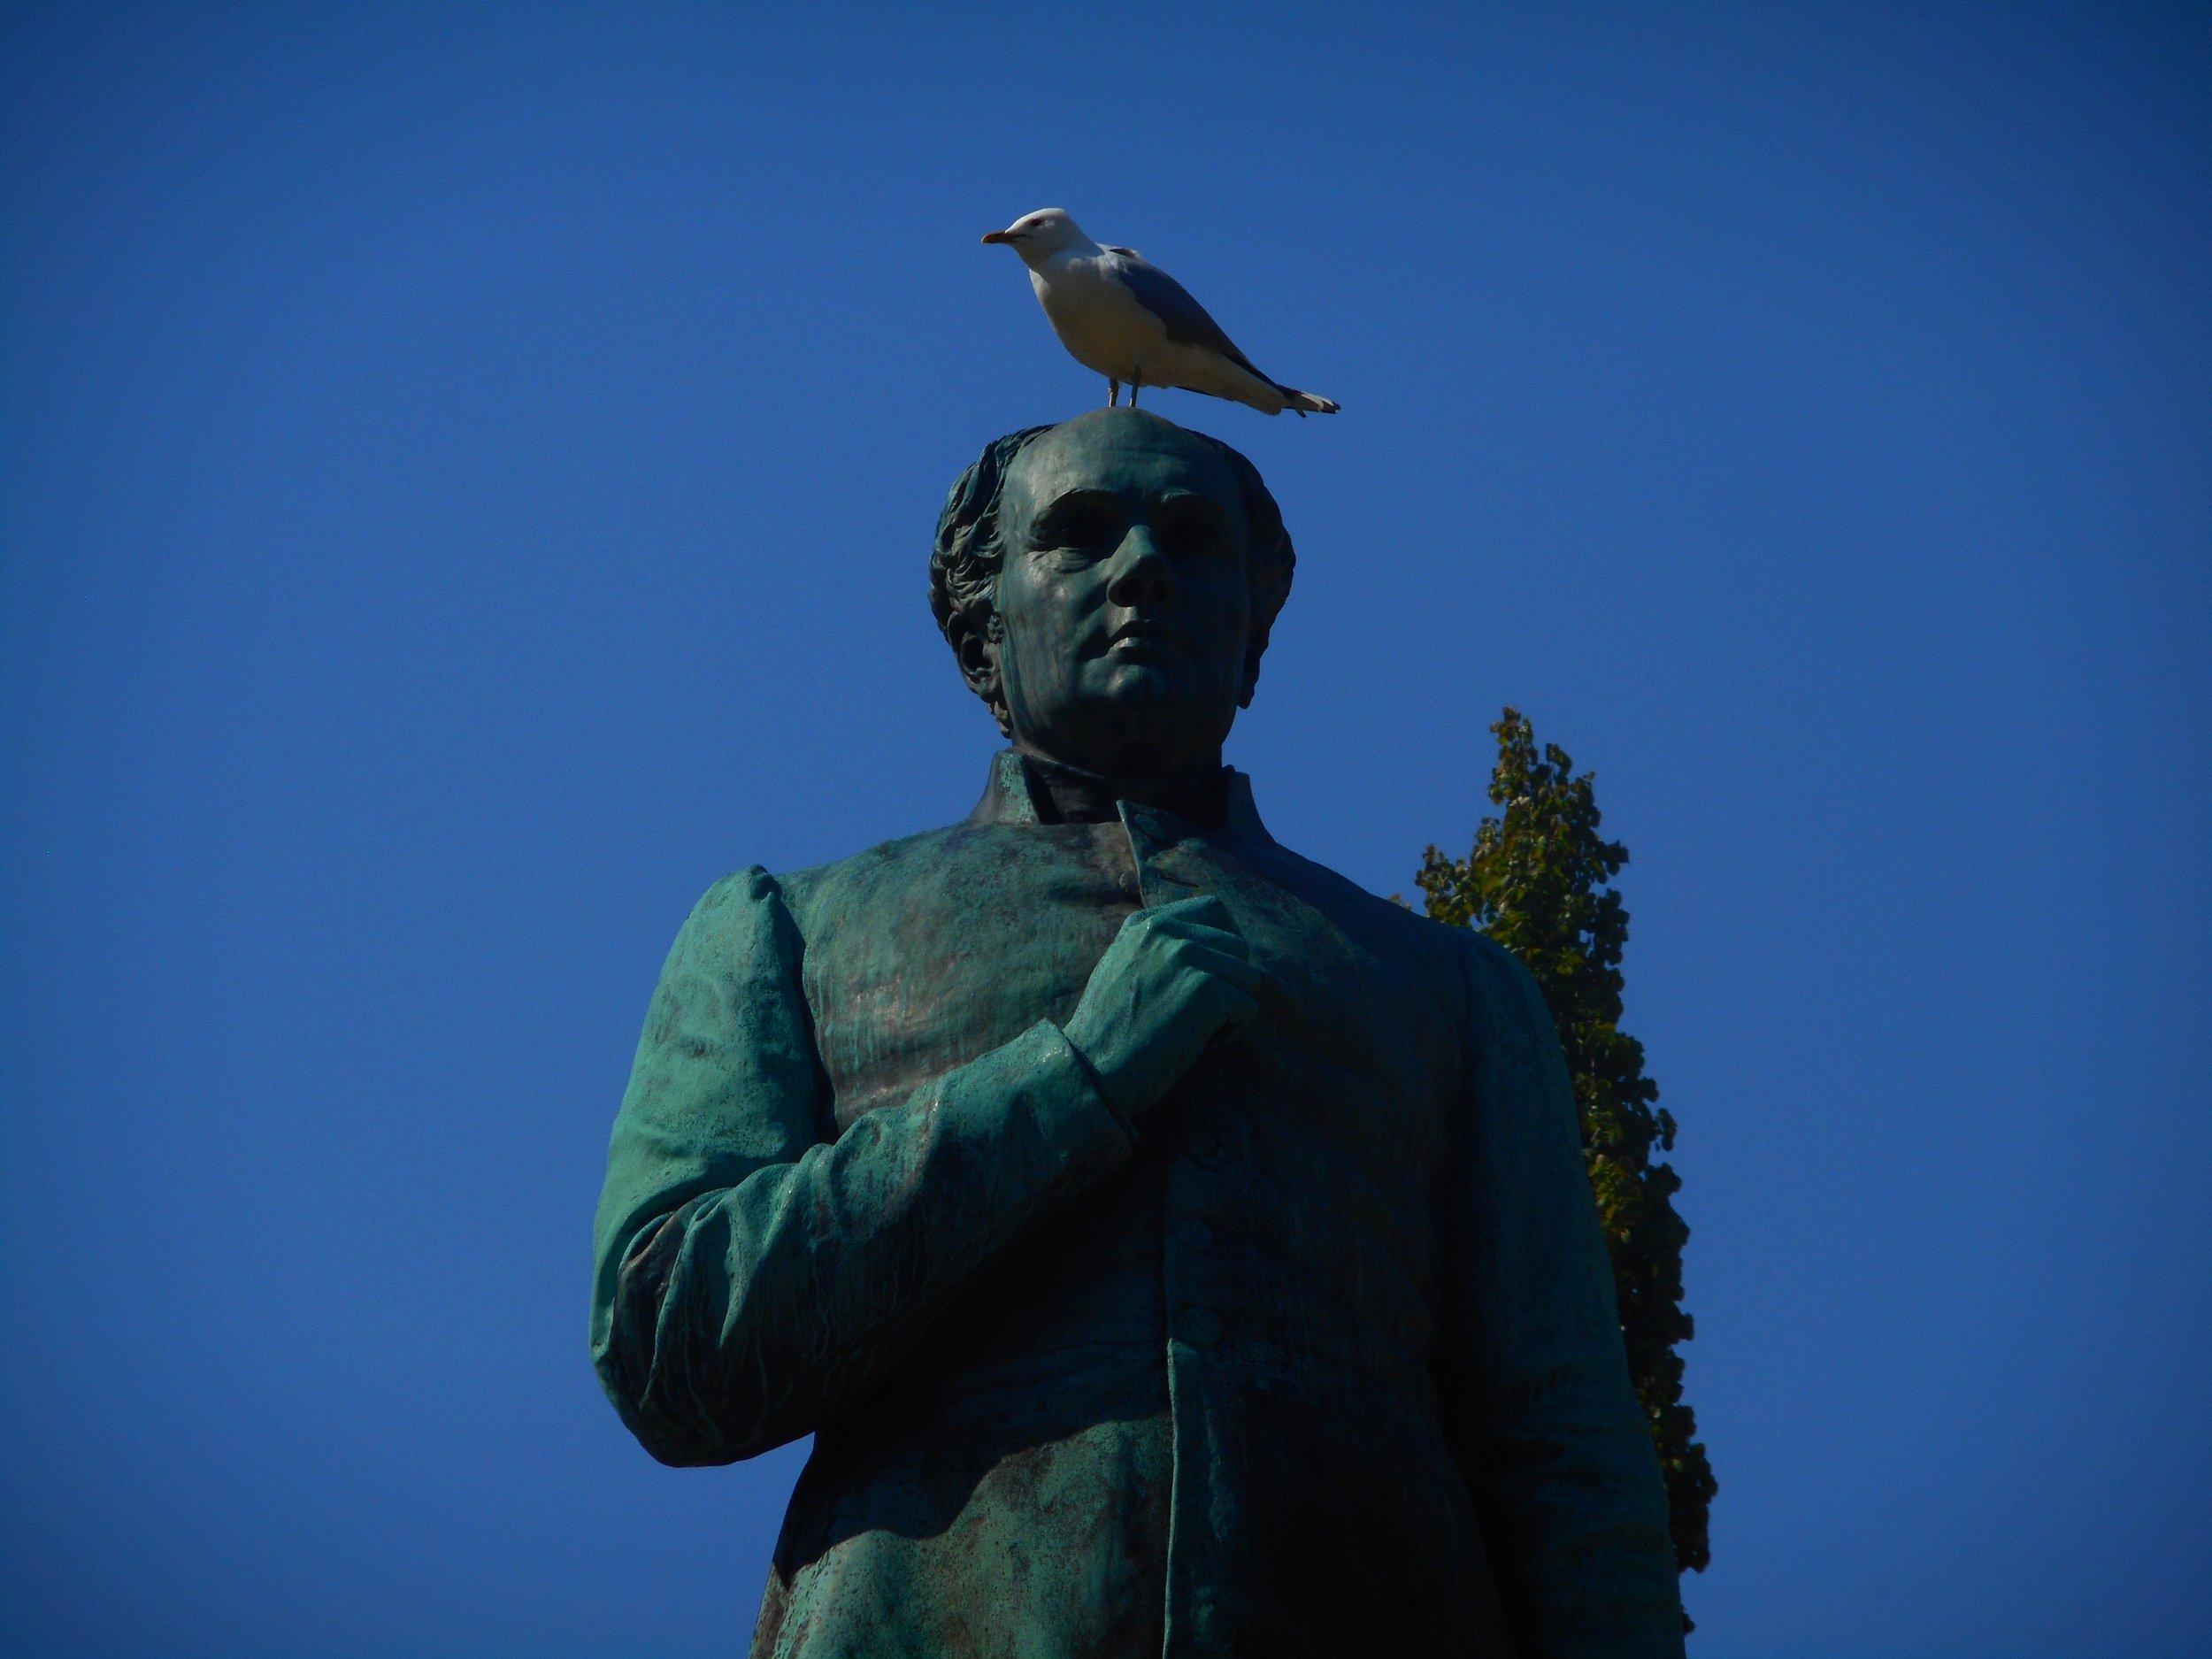 Statue of  Johan Ludvig Runeberg , national poet of Finland in  Esplanadi park  in Helsinki.